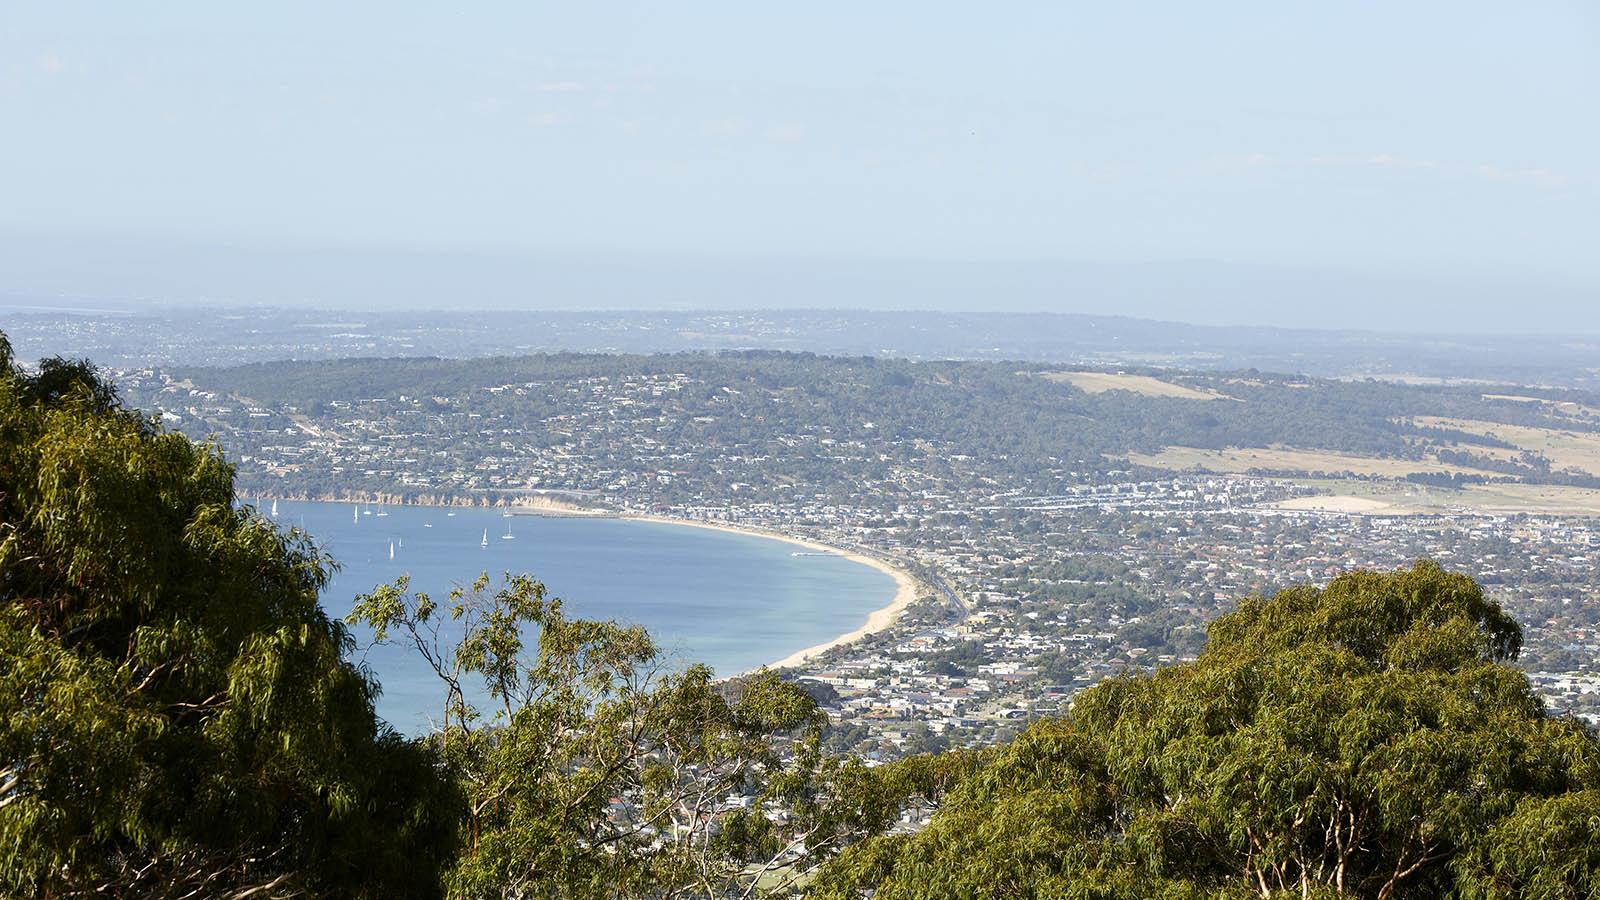 Arthurs Seat Lookout, Mornington Peninsula, Victoria, Australia